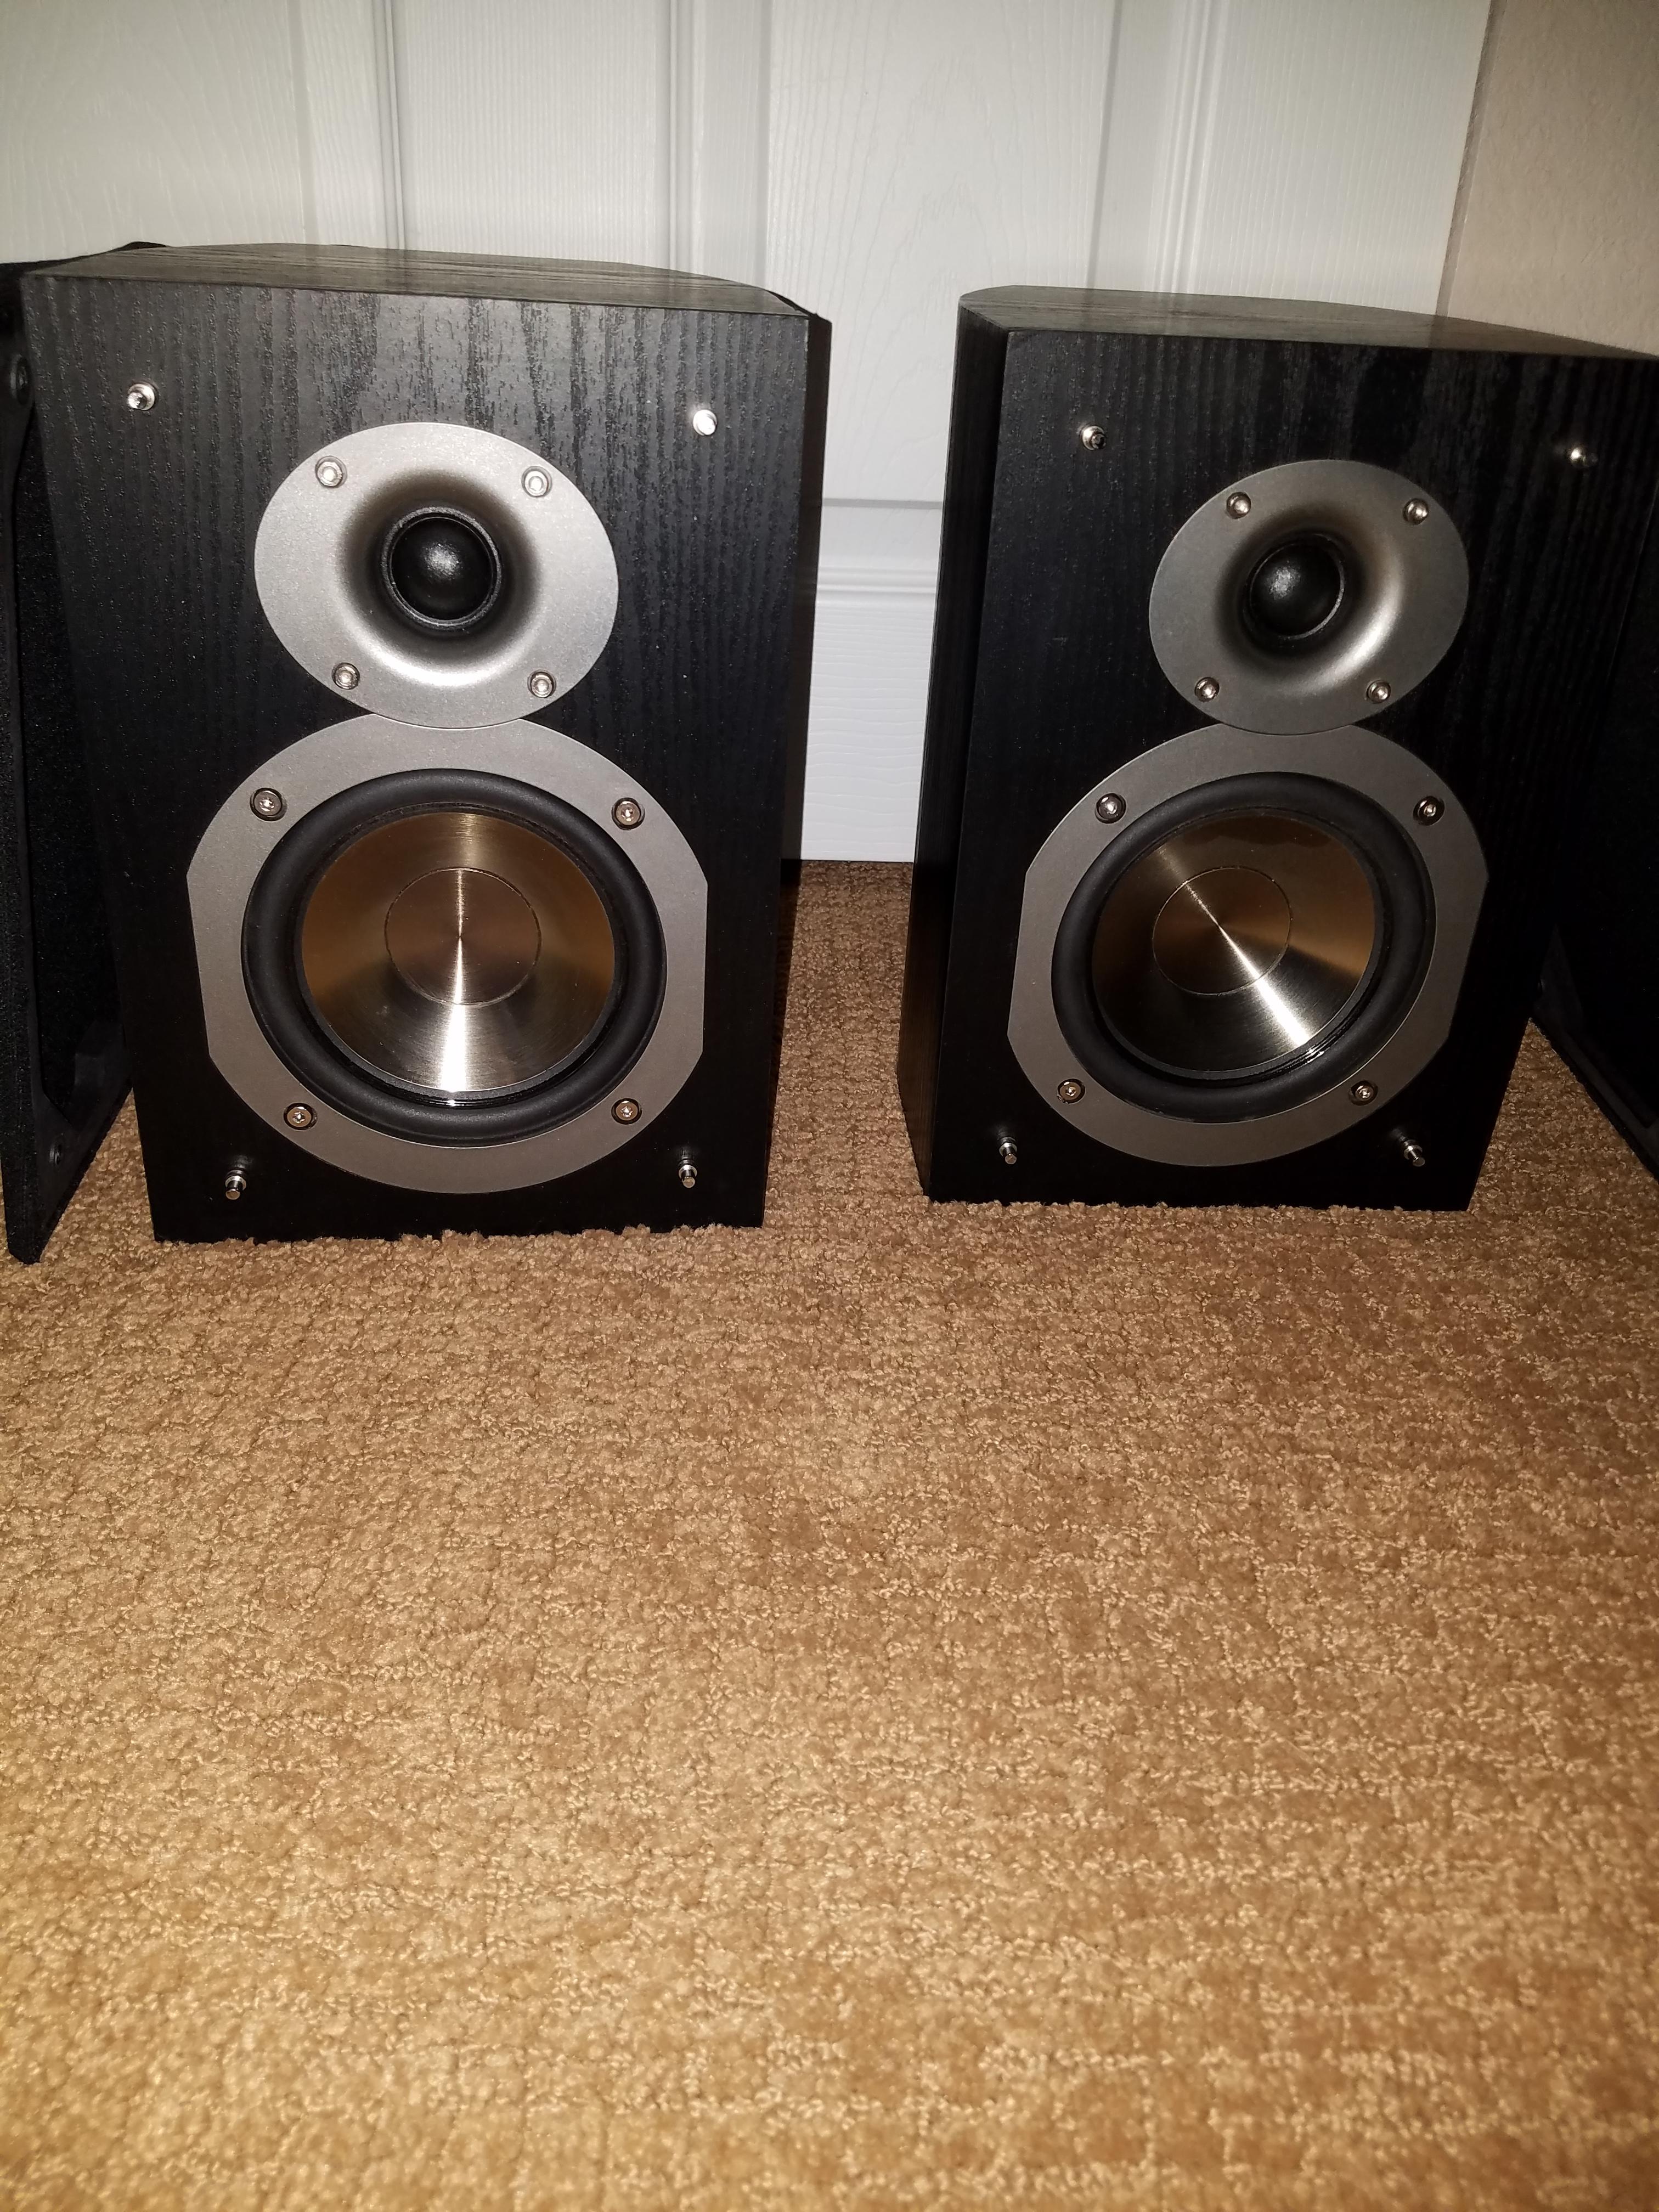 loudspeakers hero bookshelf svs speaker reviews audiohead review ultra speakers the